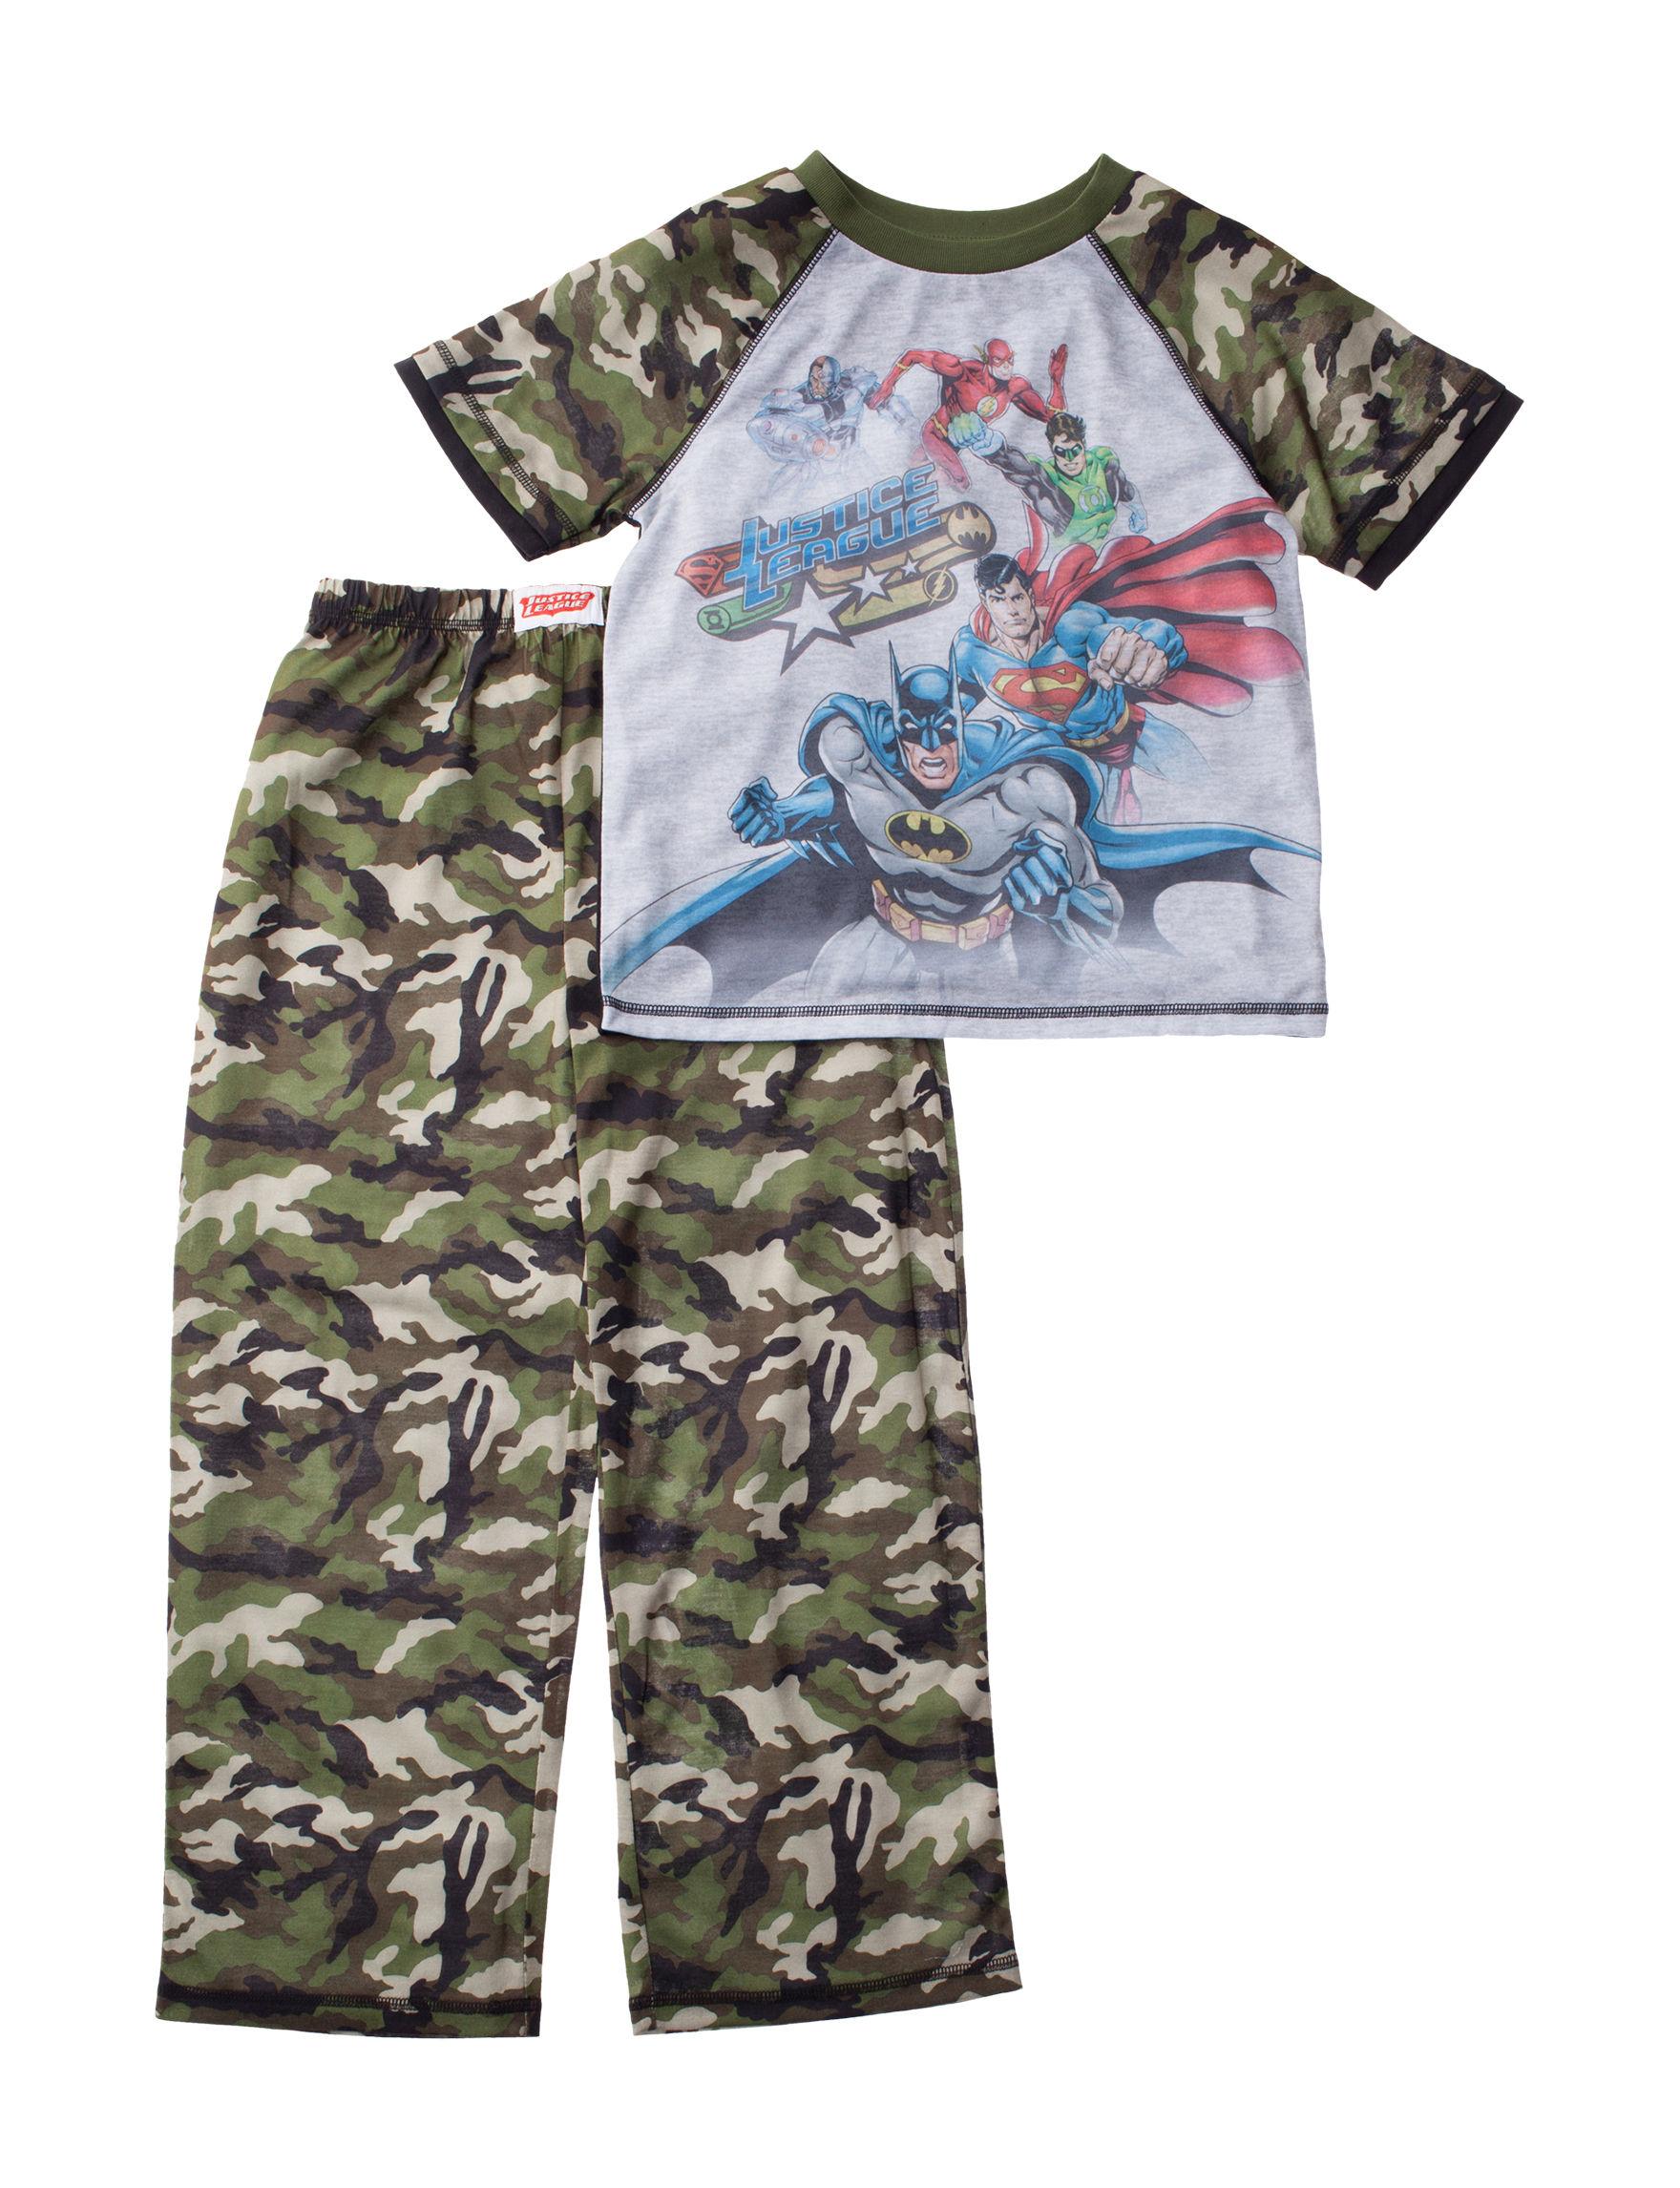 Licensed Green / Grey Pajama Sets